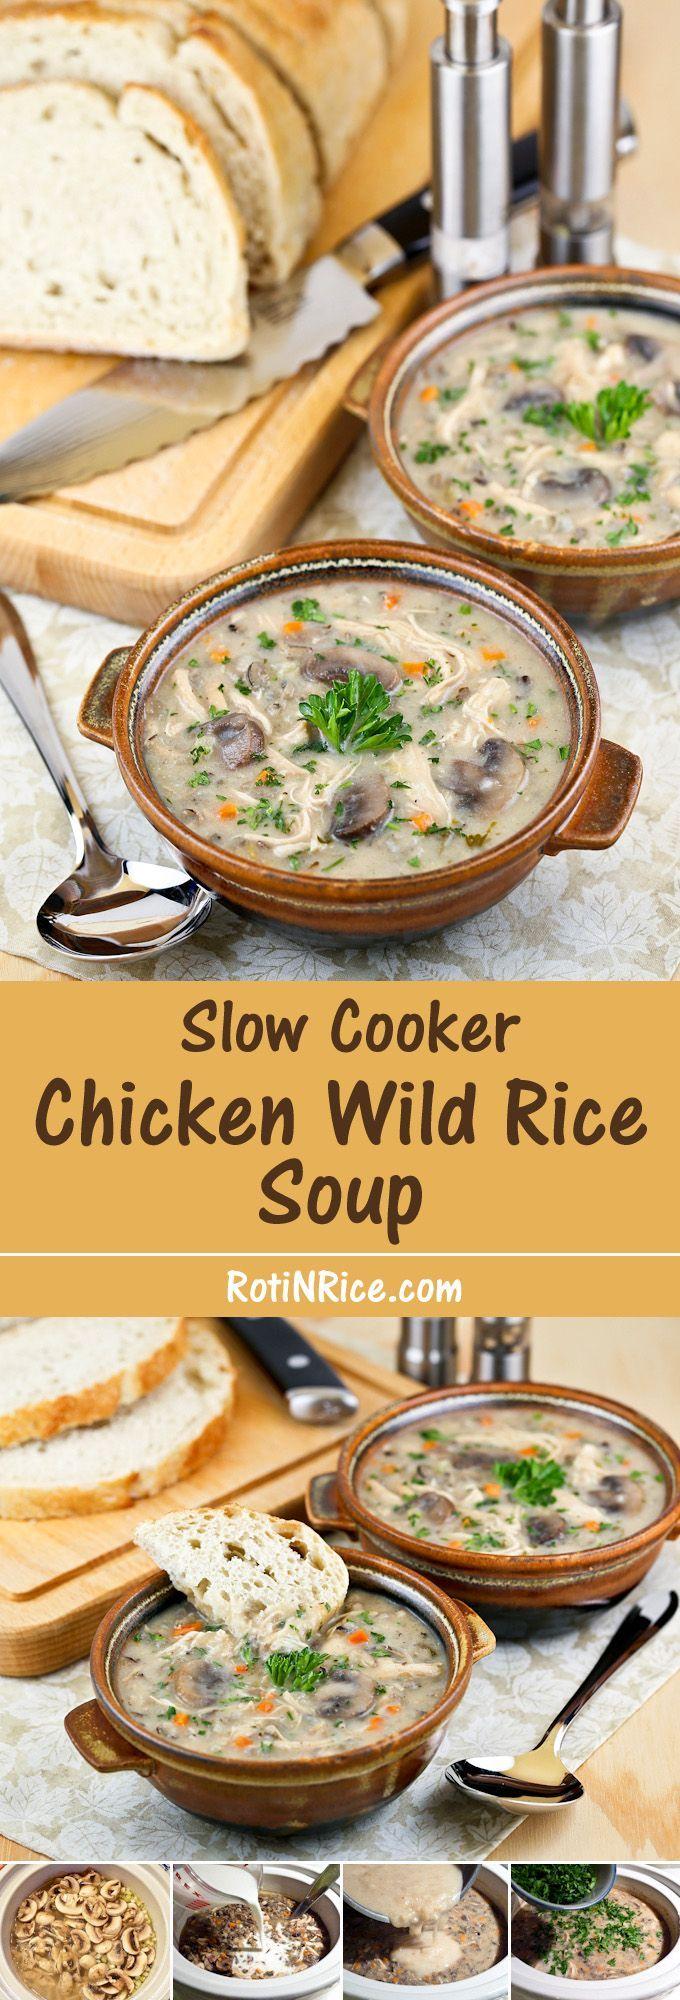 Slow Cooker Chicken Wild Rice Soup | Recipe | Wild rice ...